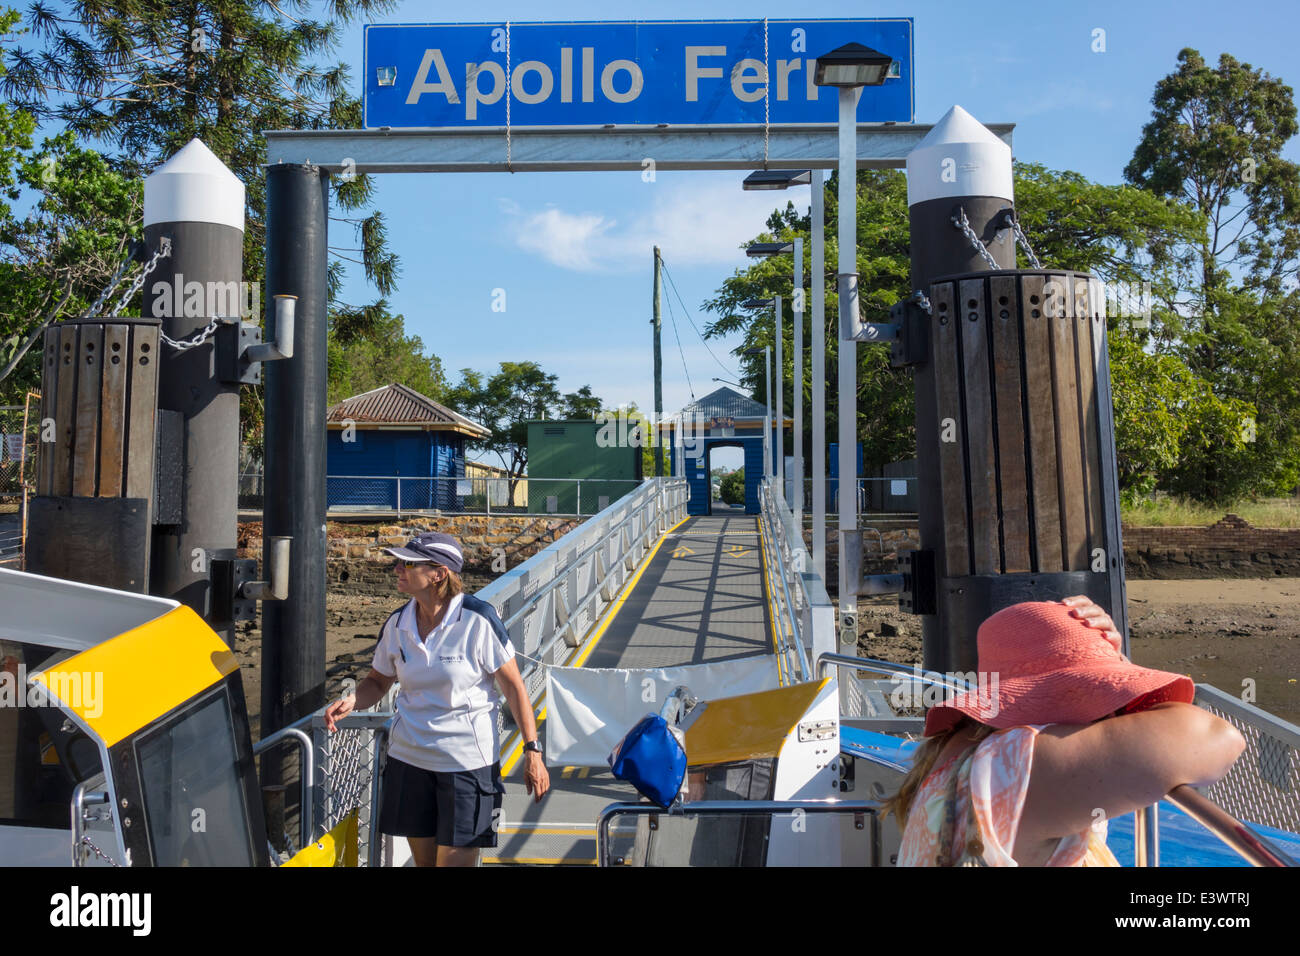 Brisbane Australia Queensland Bulimba Brisbane River Apollo Ferry Terminal ferry boat public transportation CityCat - Stock Image